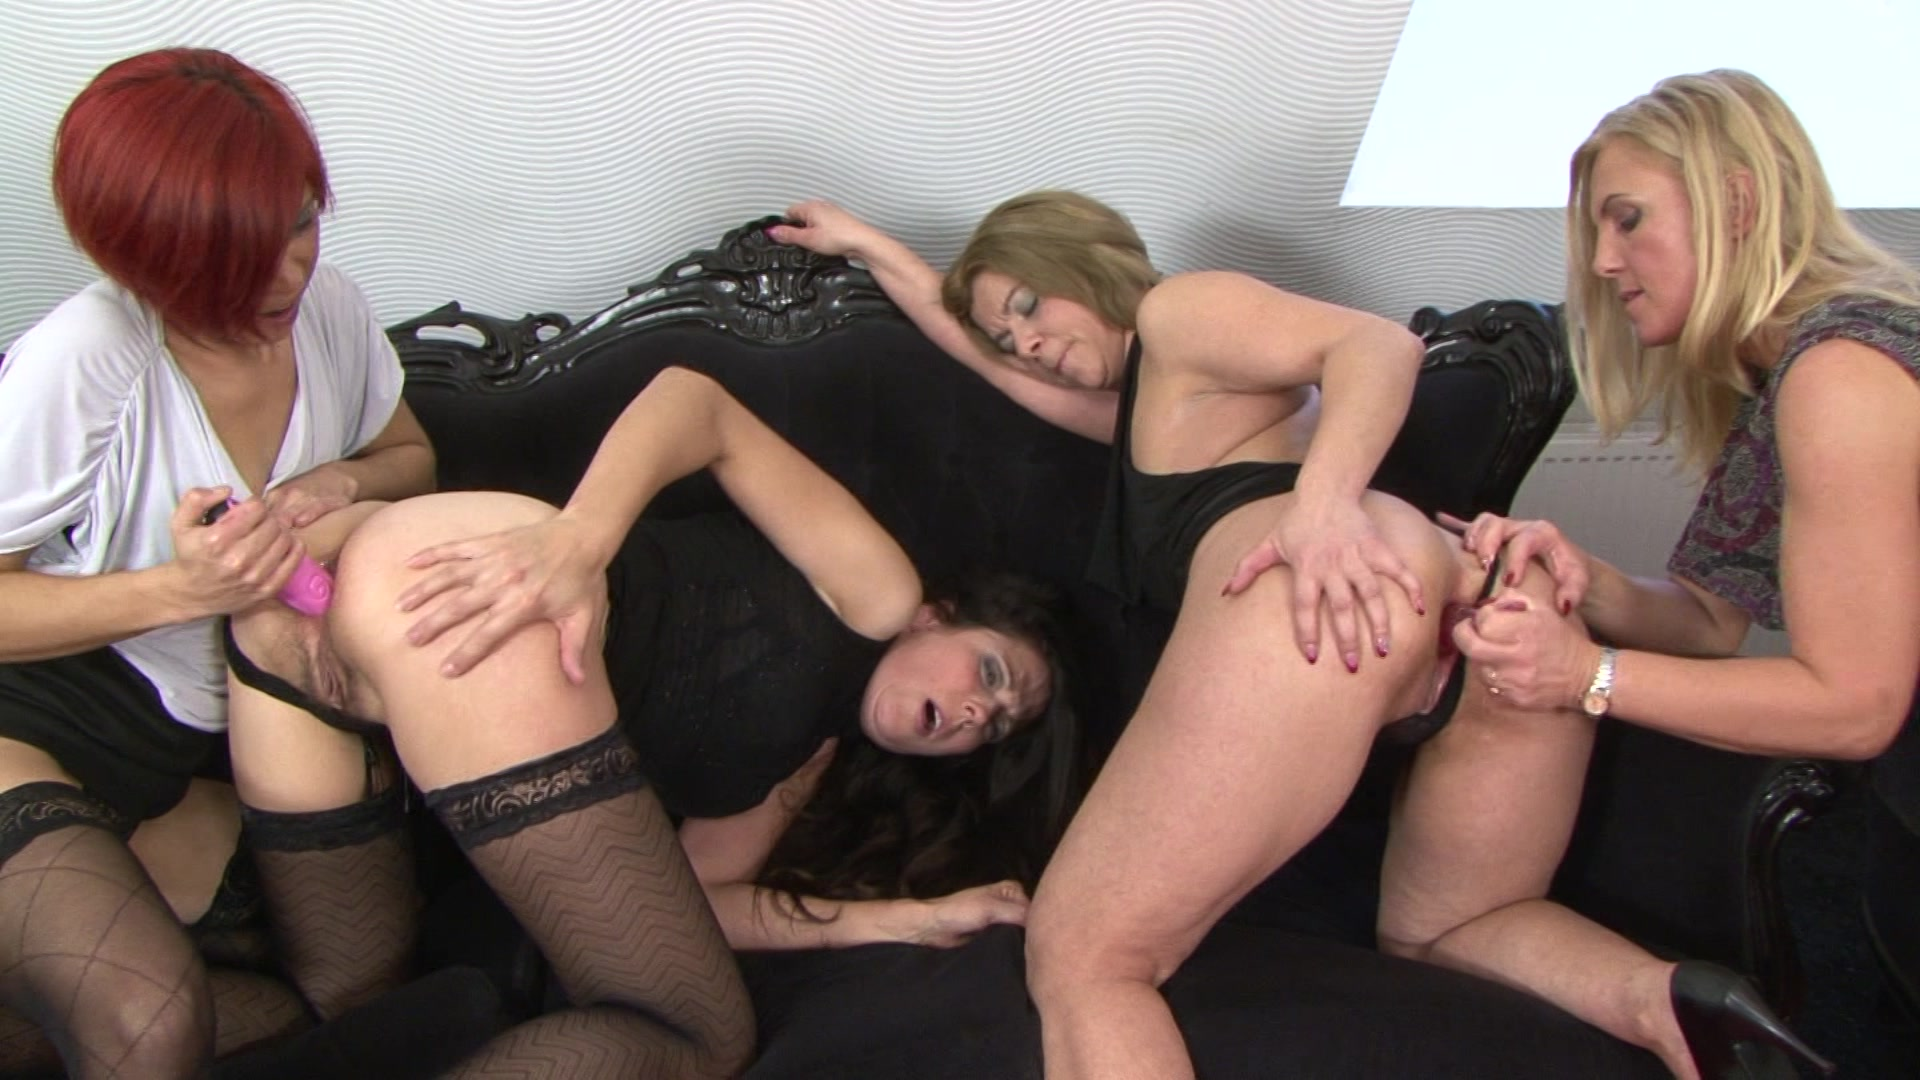 Free asia carrera porn pics